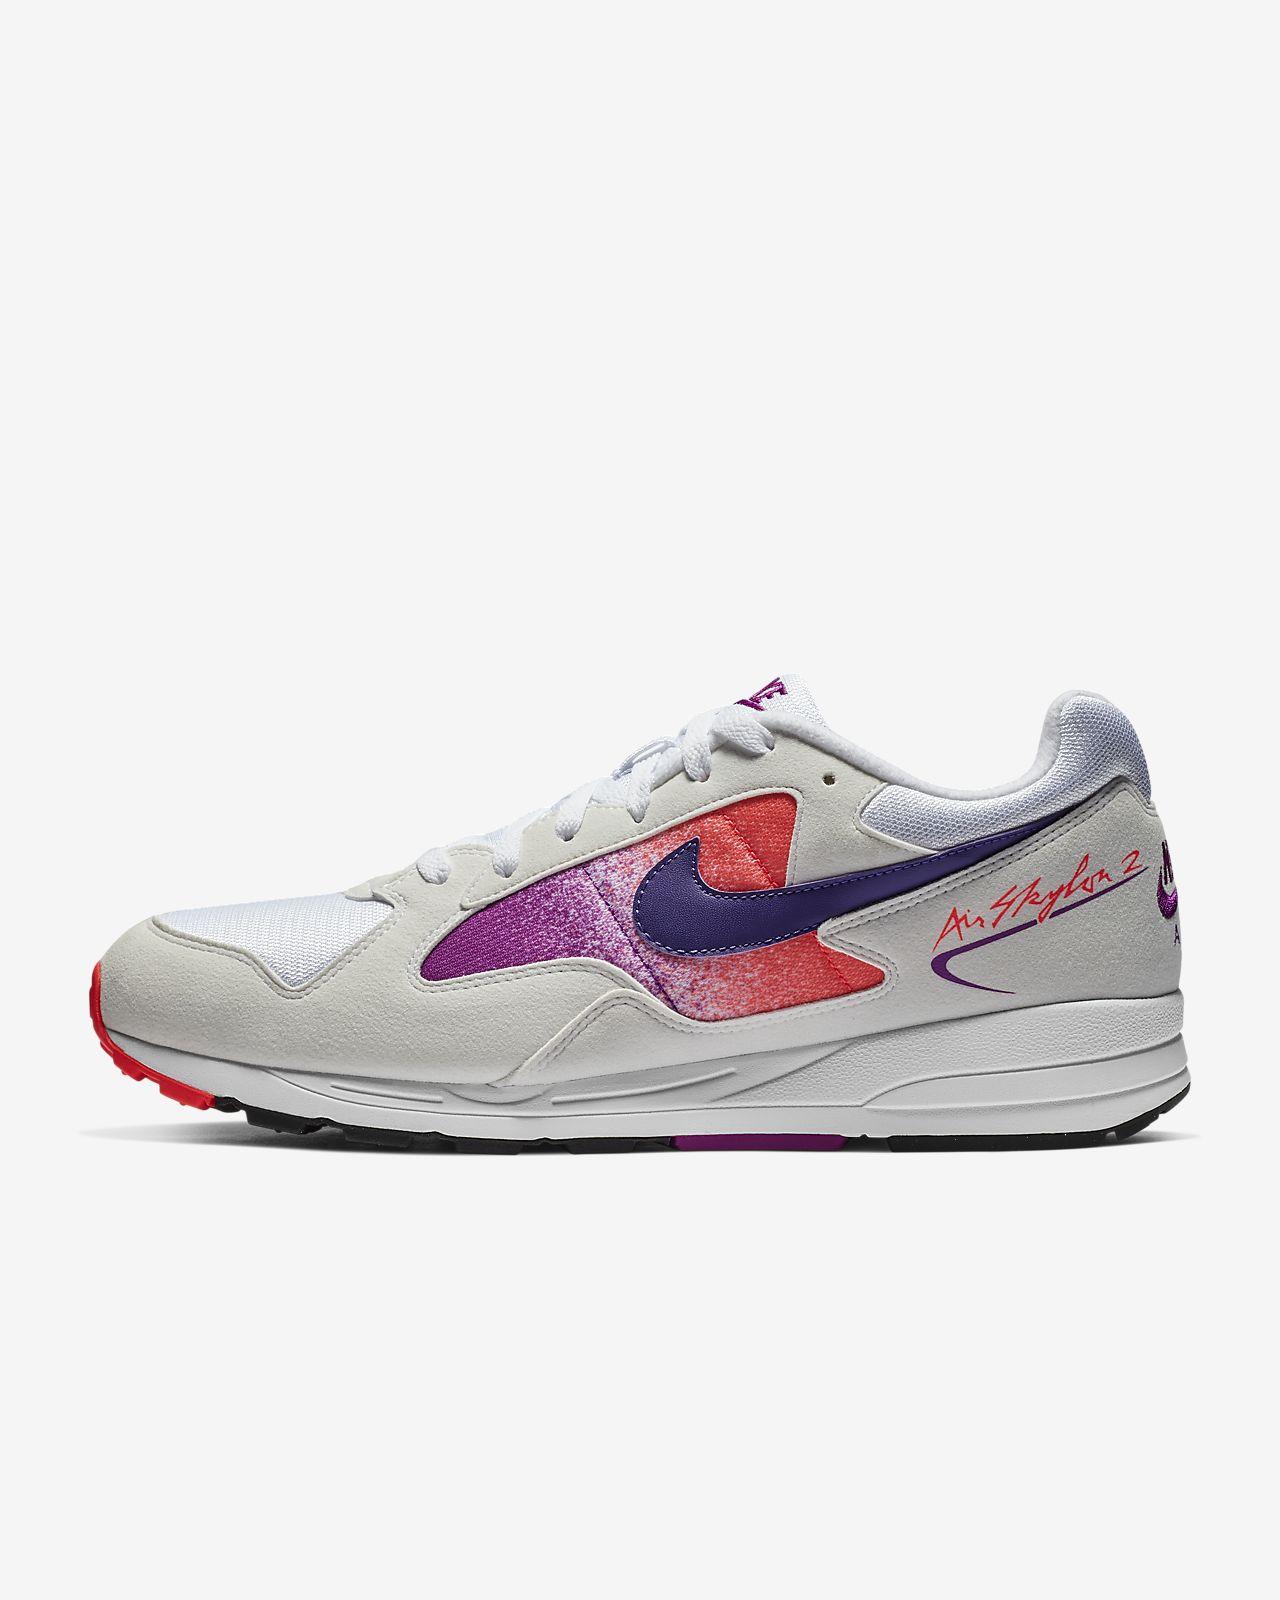 sports shoes 3470e 2fe43 ... Nike Air Skylon II-sko til mænd